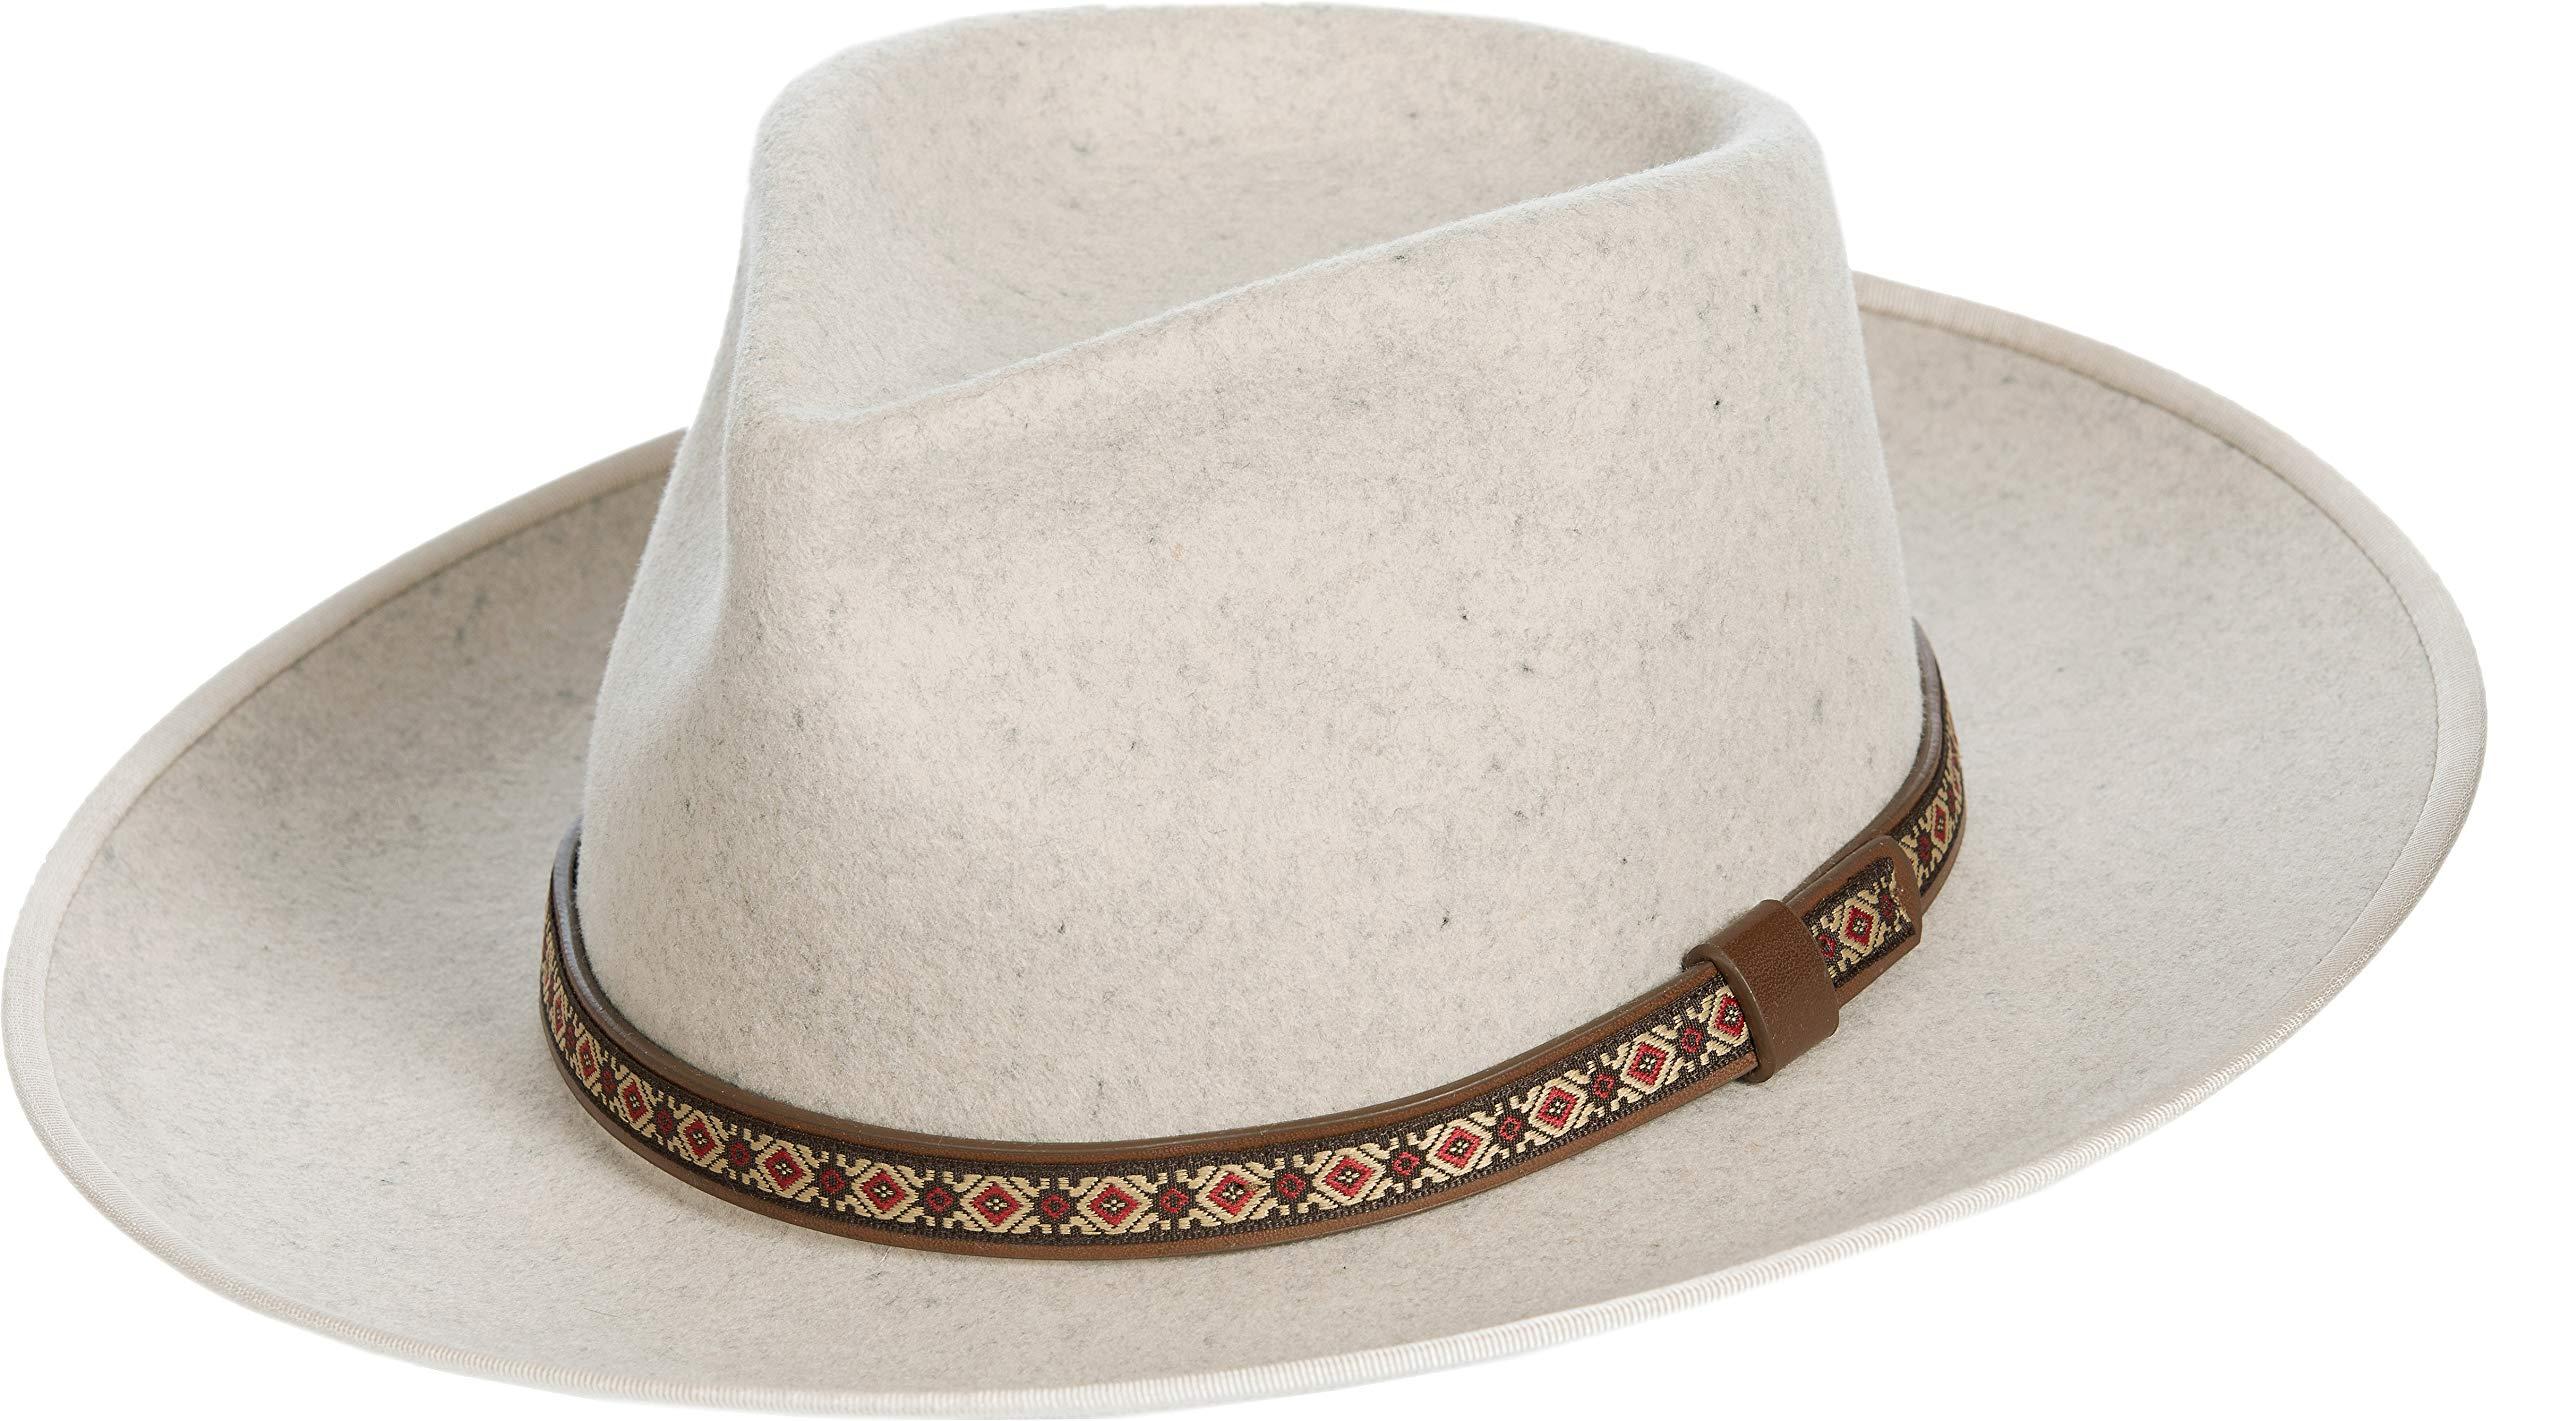 Overland Sheepskin Co Alpes Wide Brim Wool Felt Fedora Hat by Overland Sheepskin Co (Image #1)